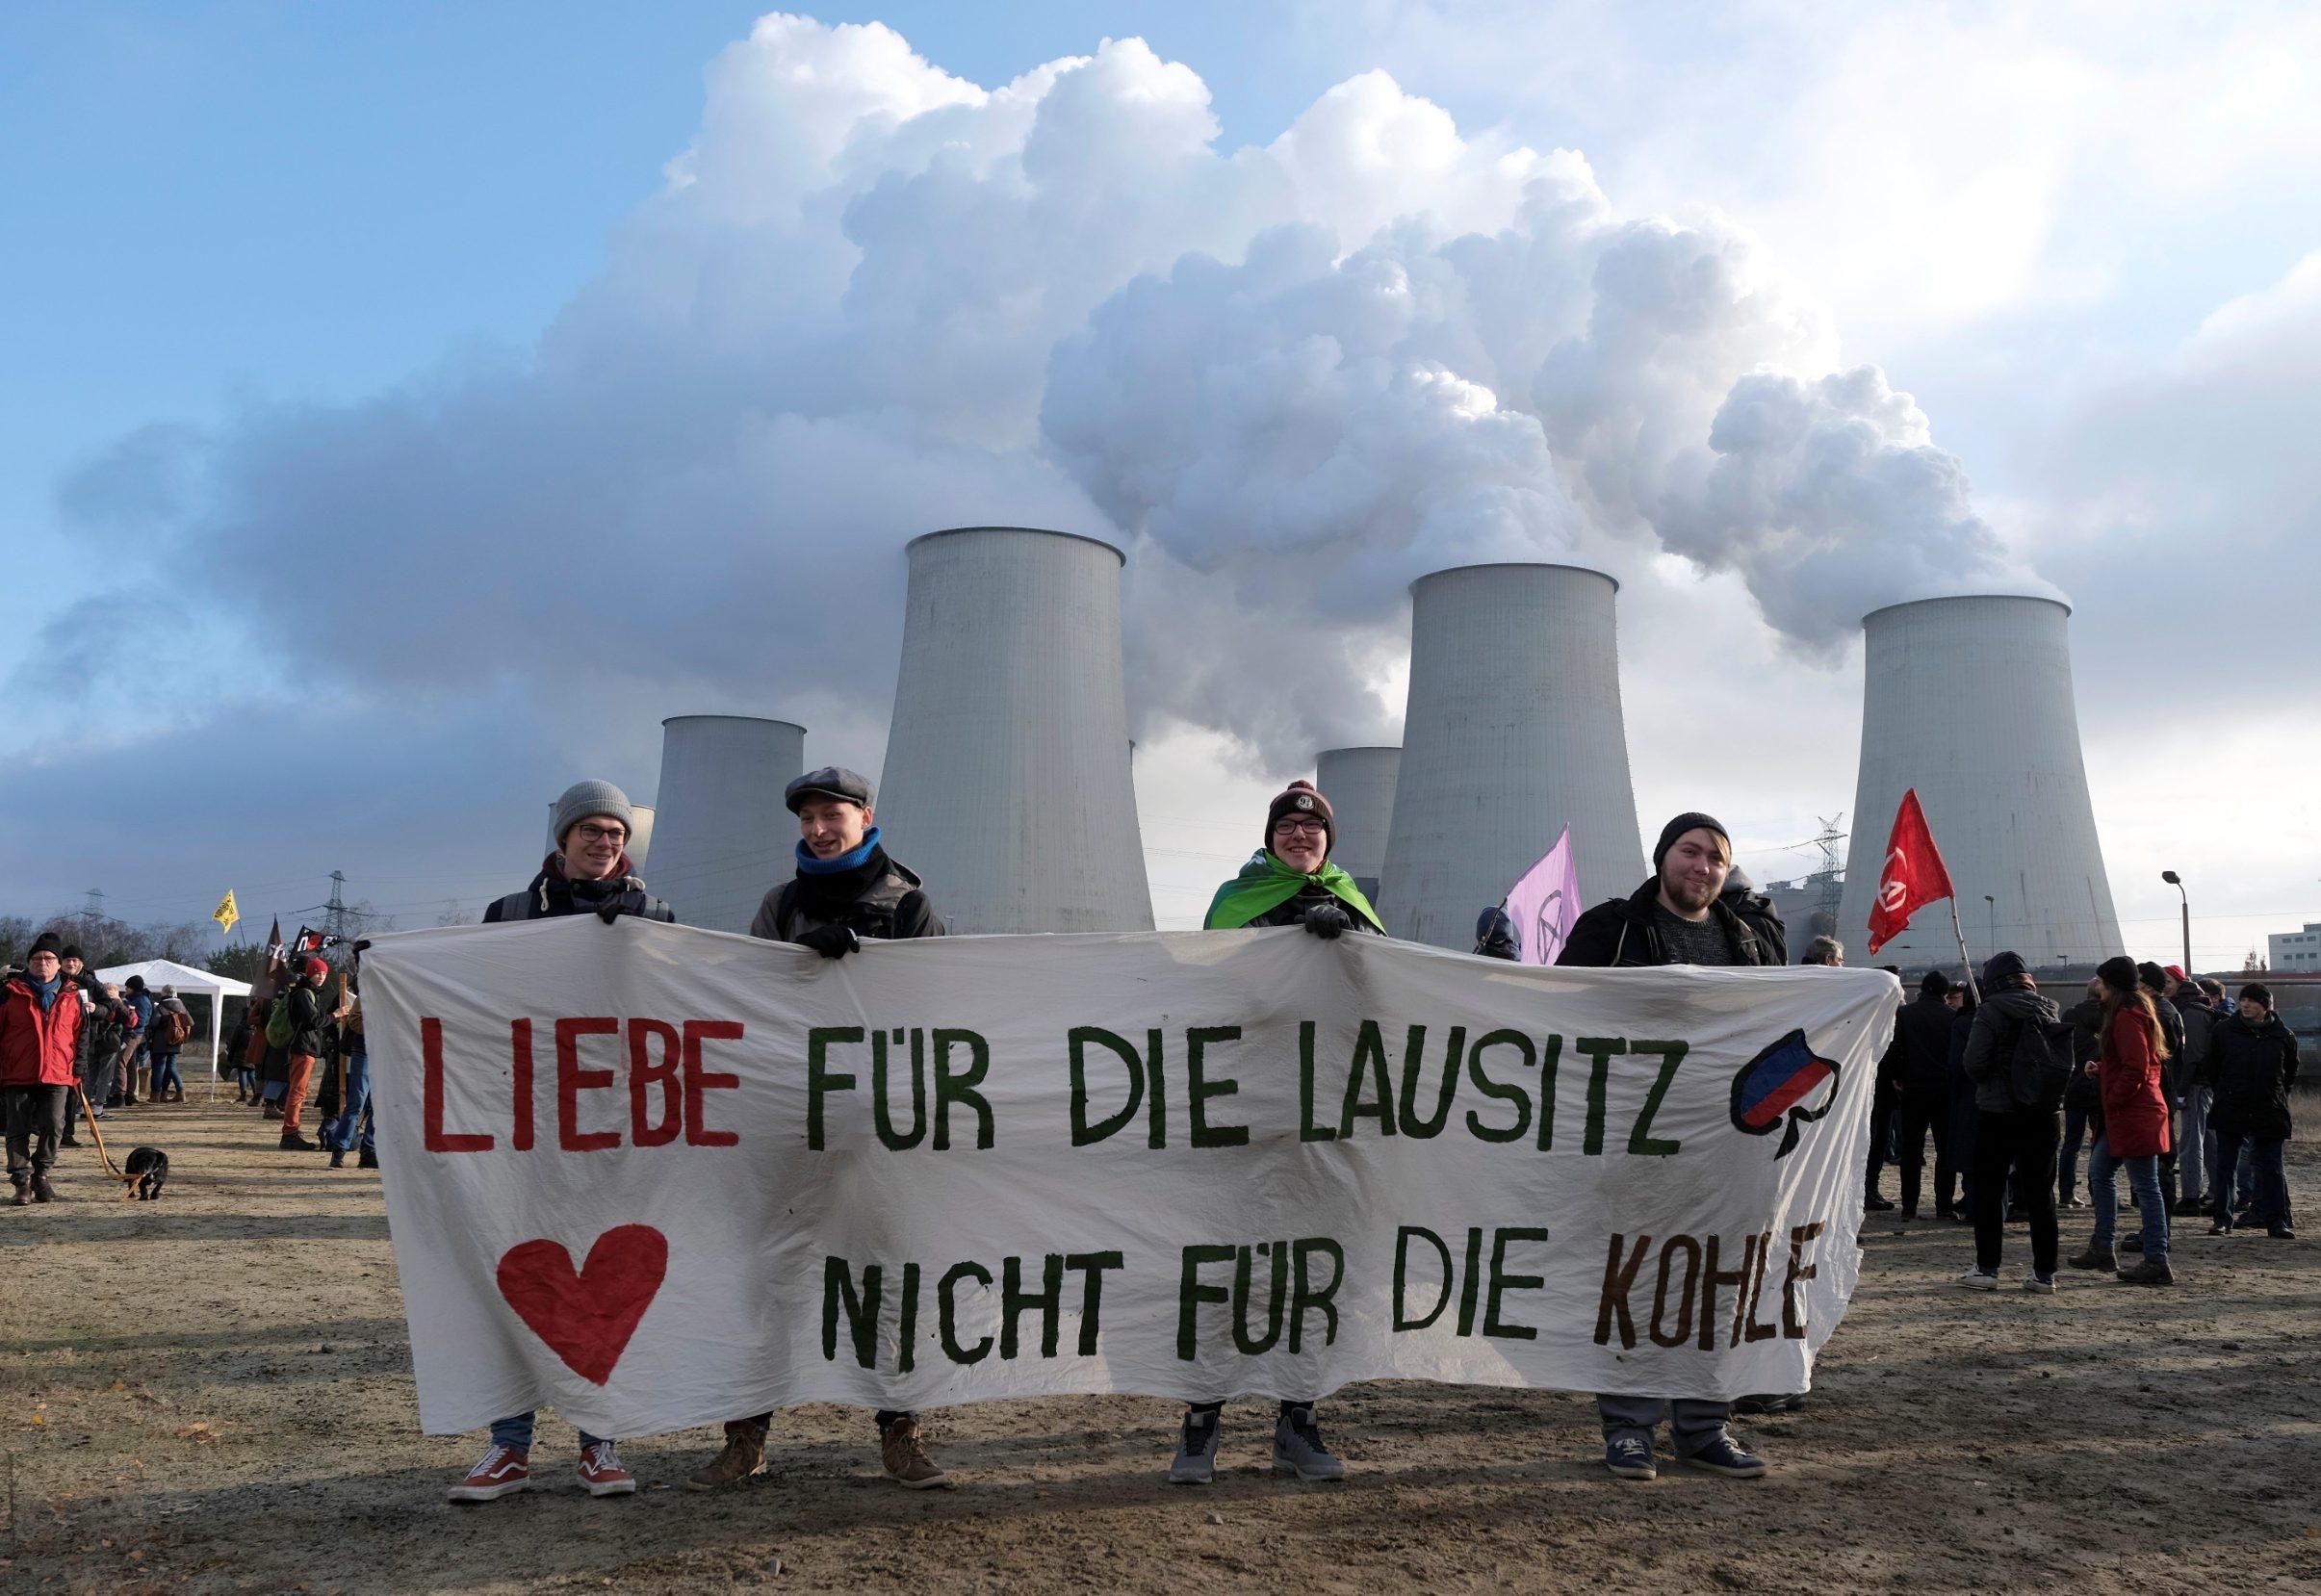 2019-11-30T120022Z_25056534_RC2OLD9W2QPF_RTRMADP_3_GERMANY-ENERGY-COAL